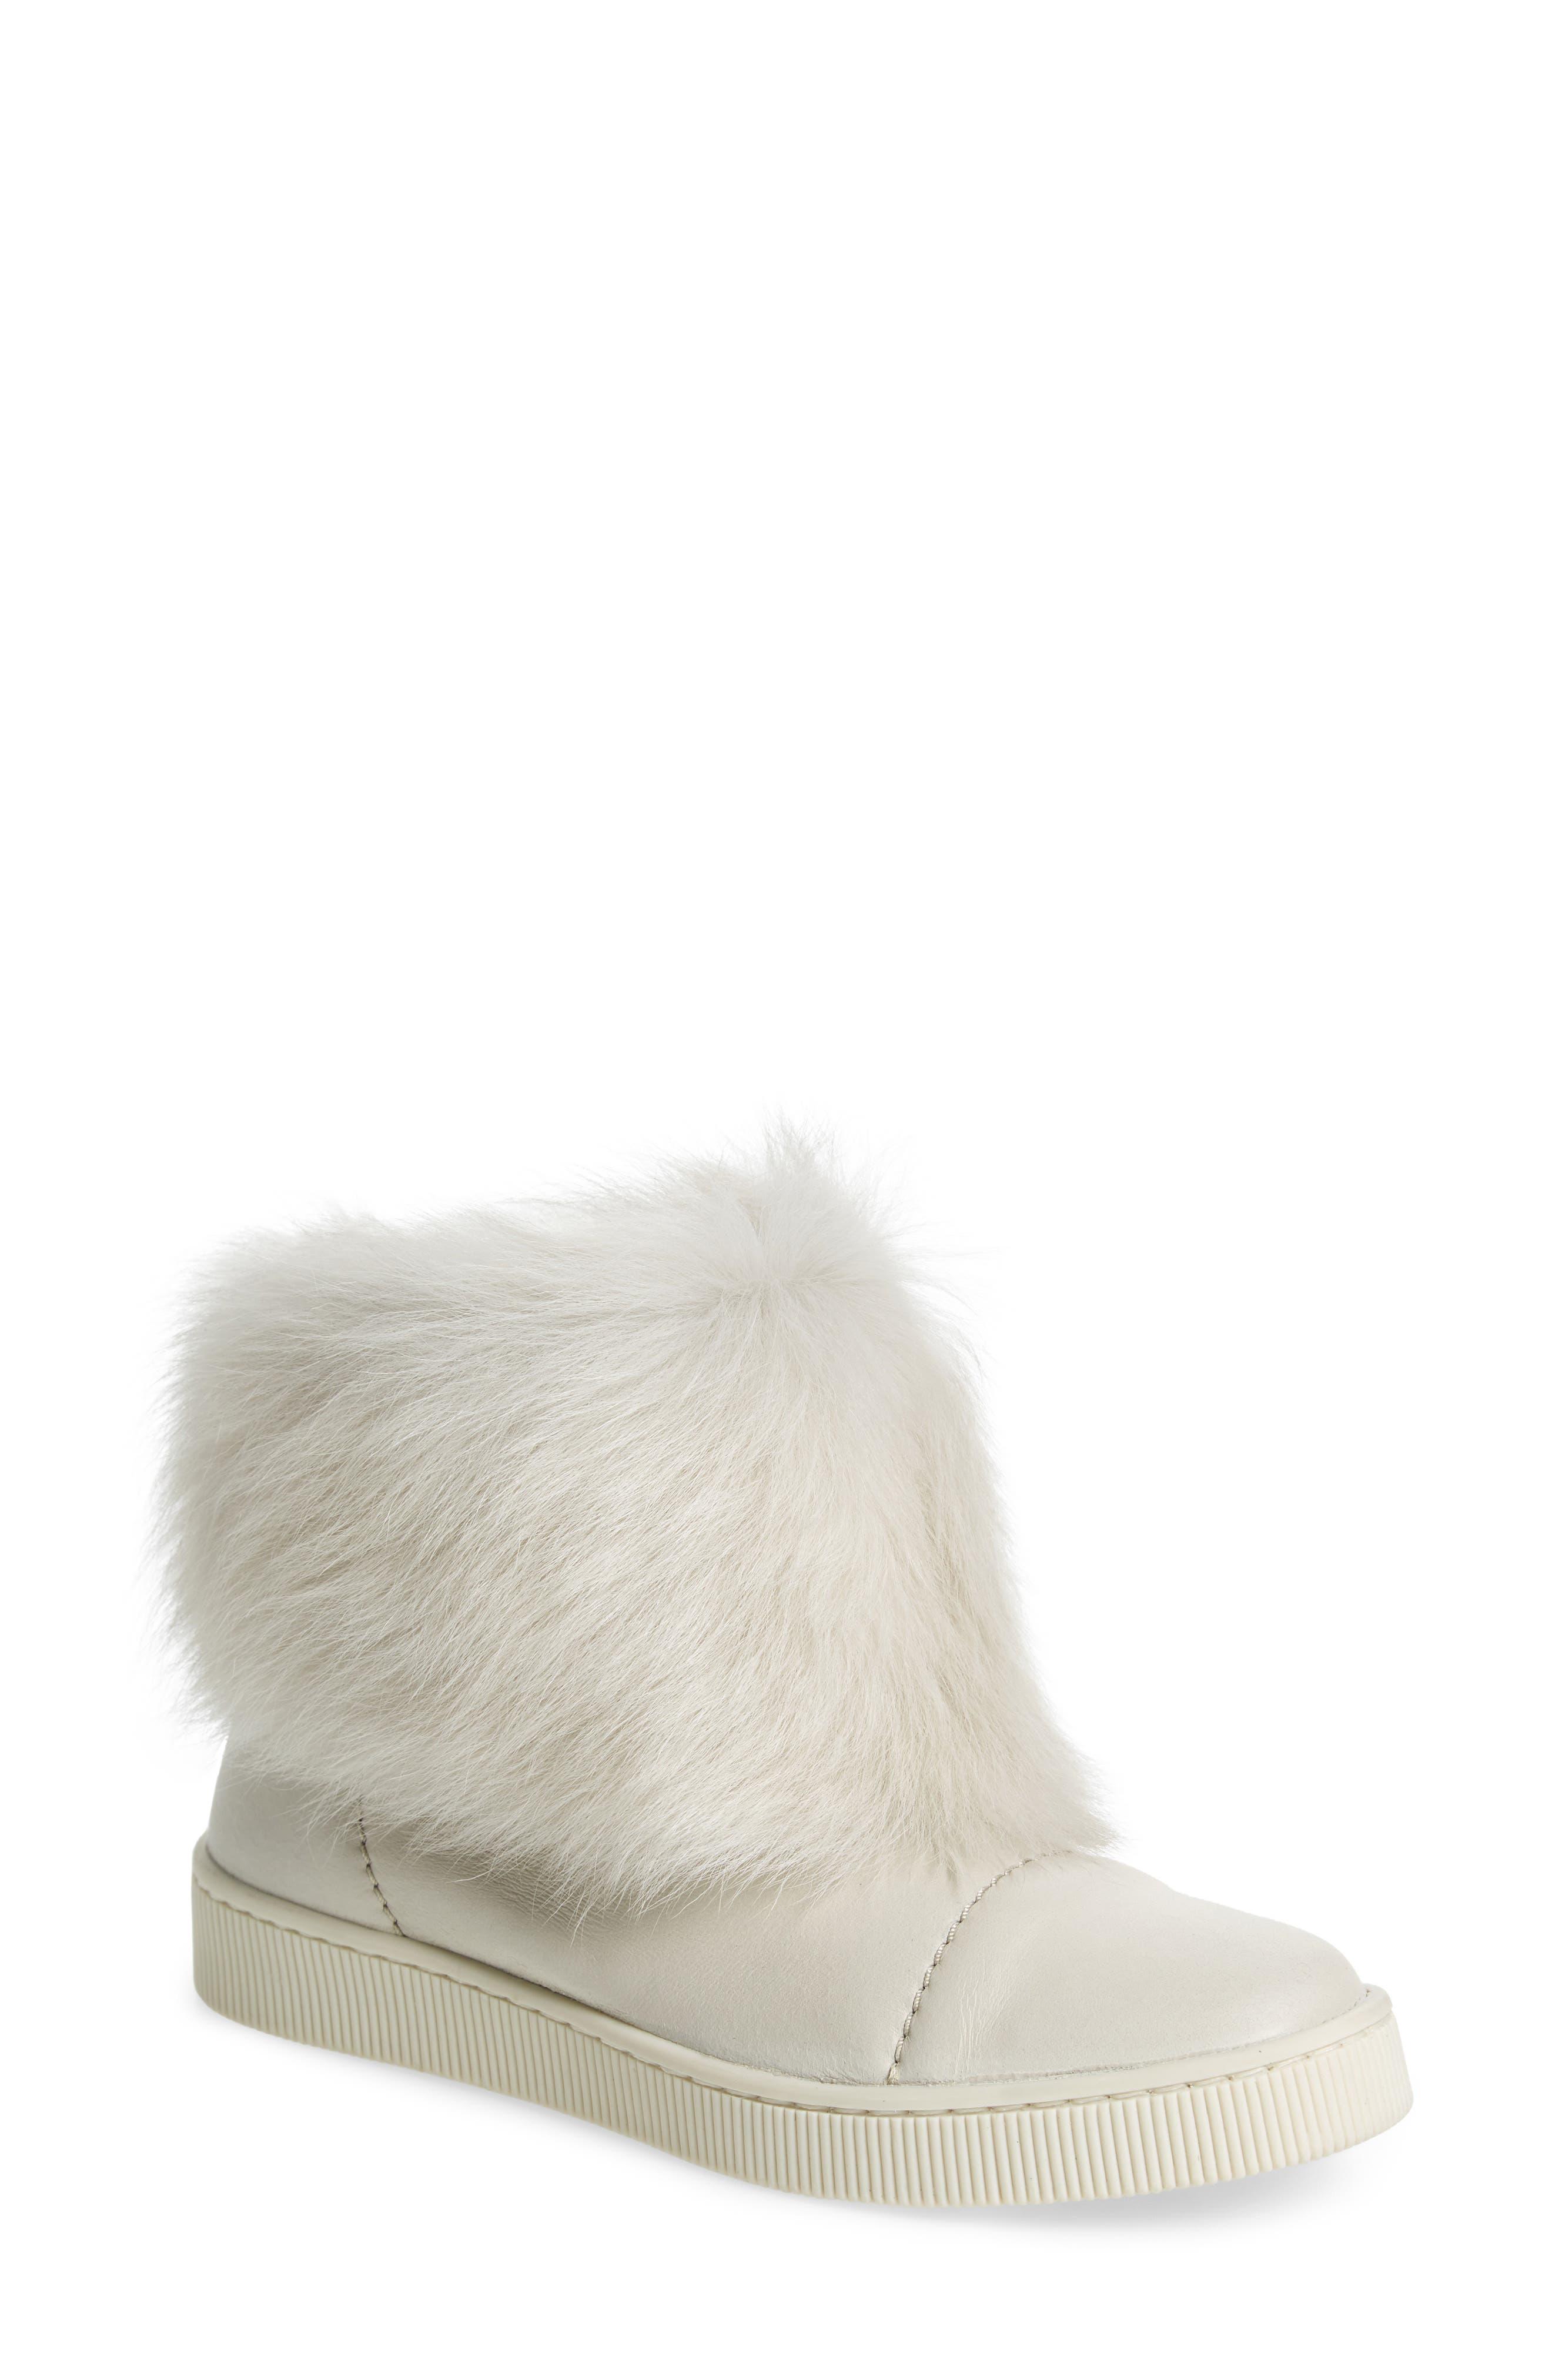 Main Image - Pedro Garcia Priya Genuine Shearling Sneaker Boot (Women)